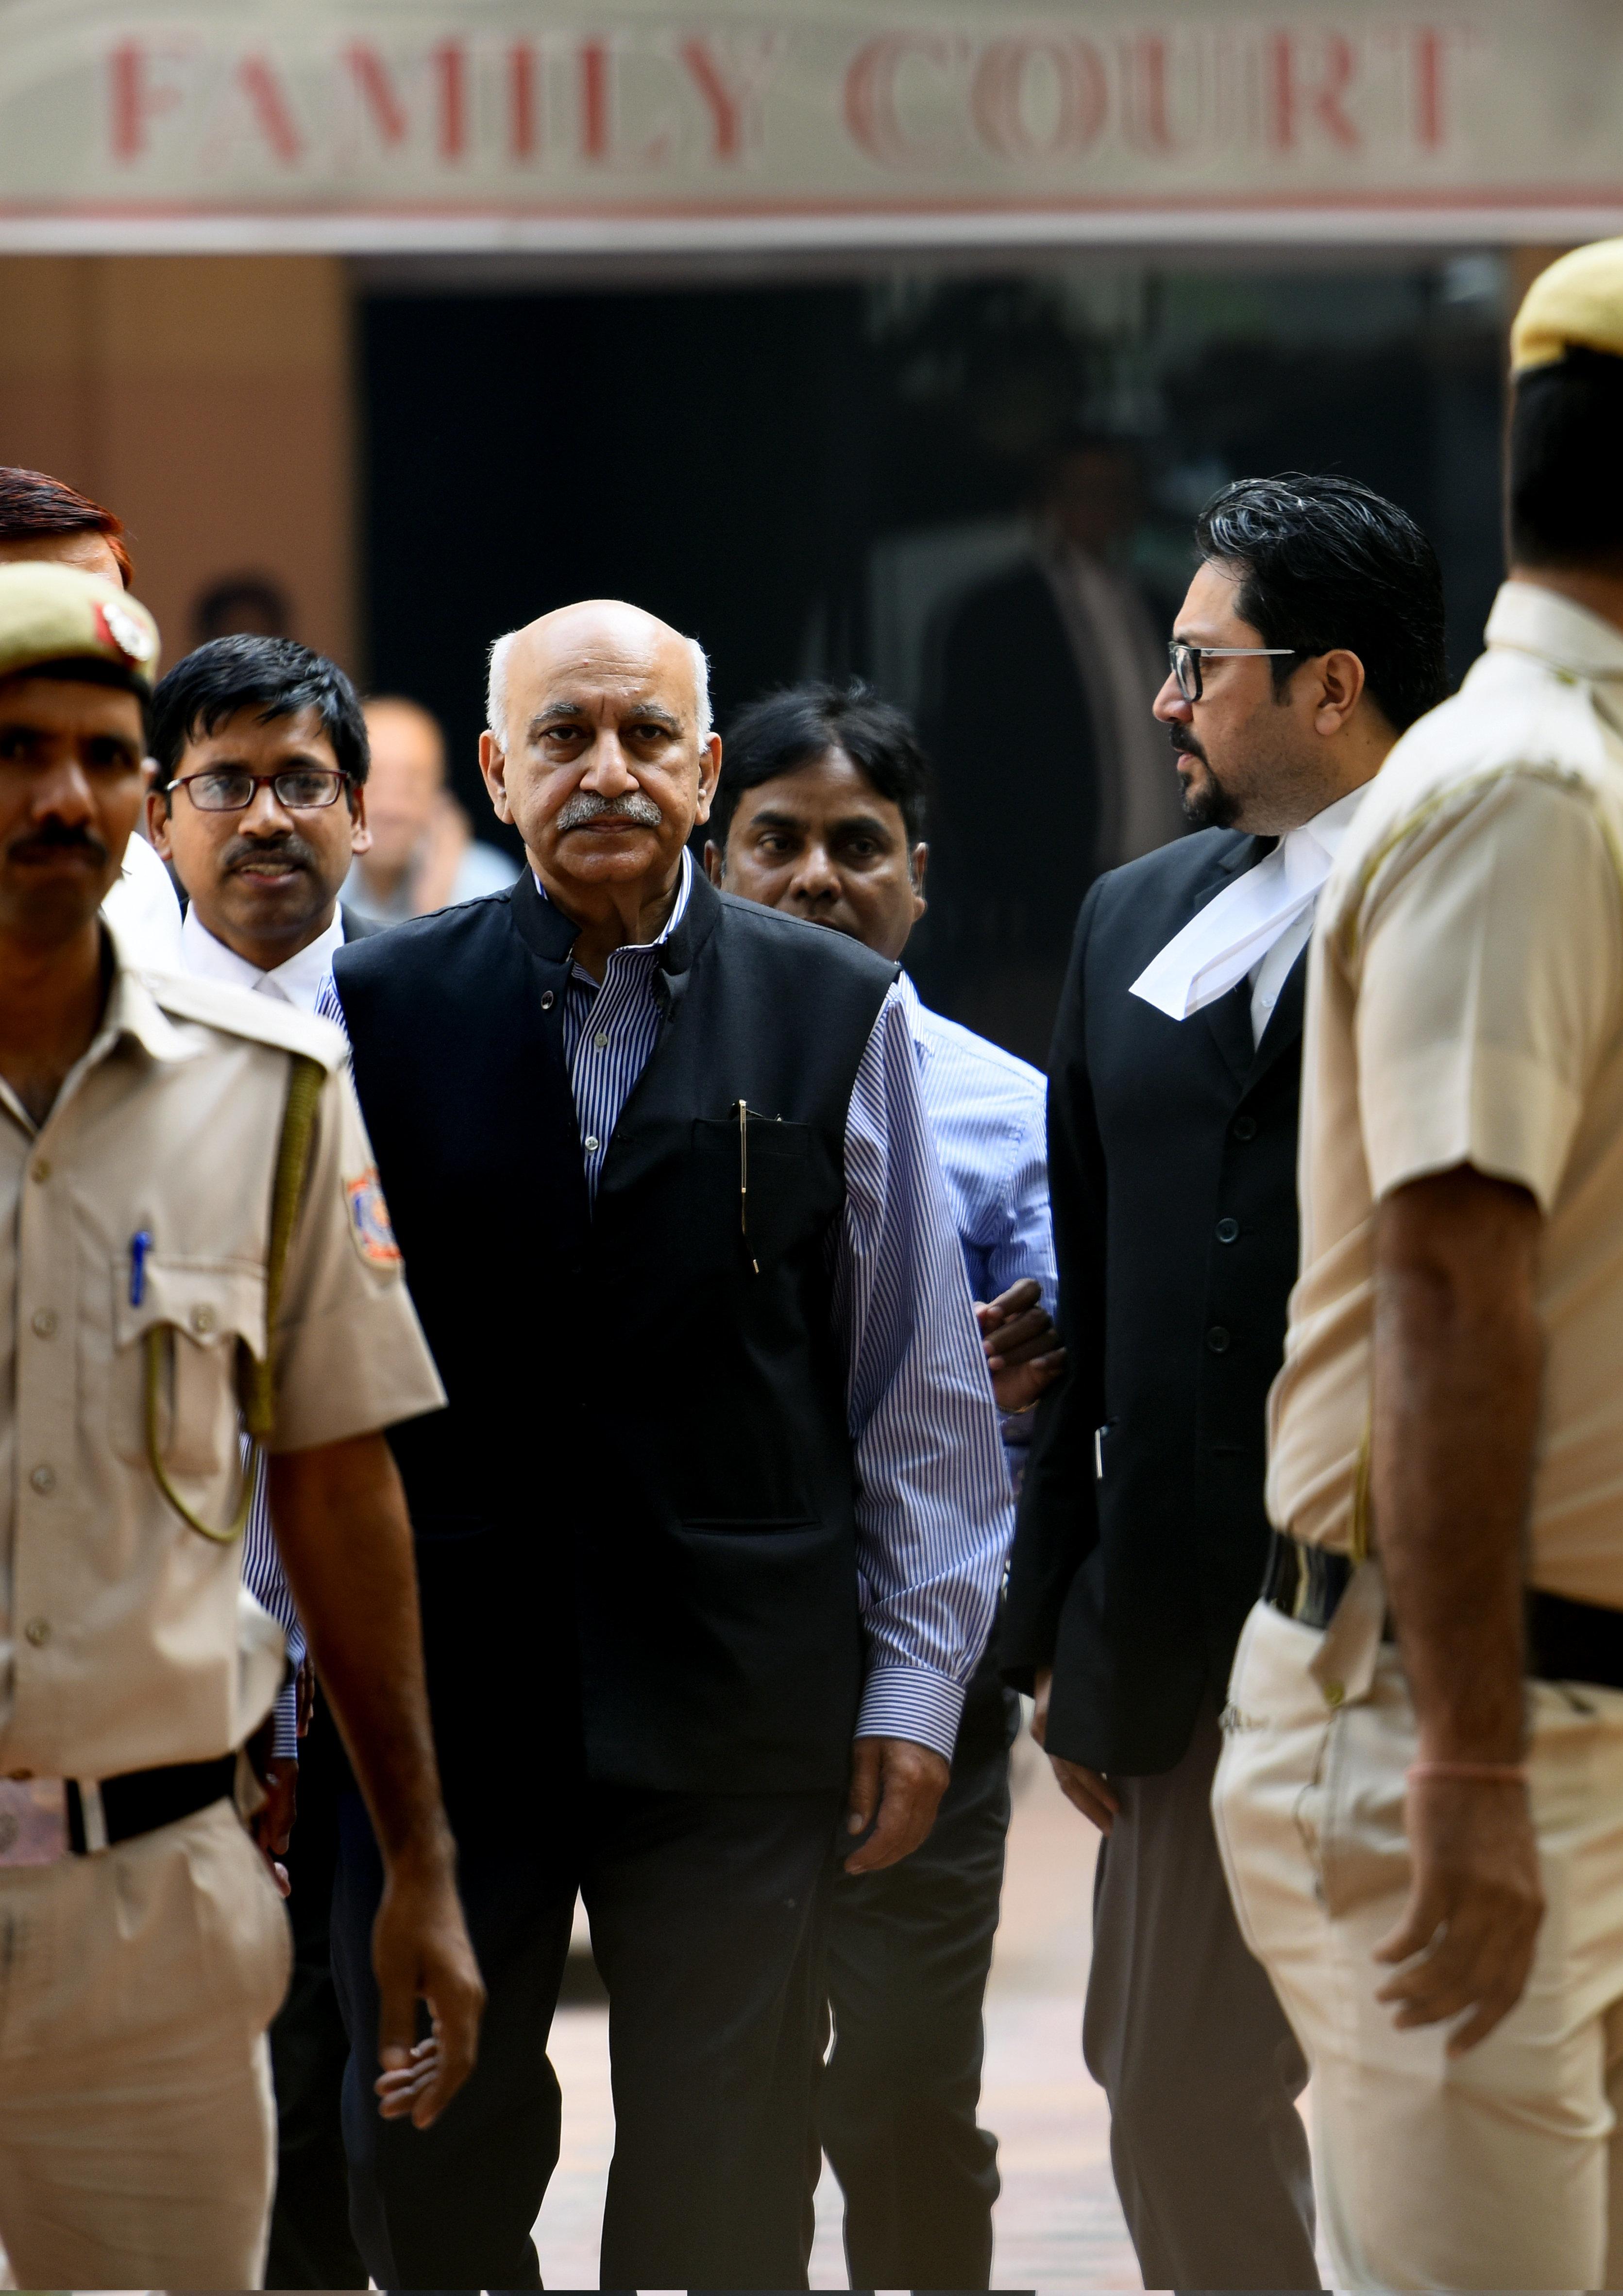 MJ Akbar Defamation Case: Court Reserves Order On Summoning Journalist Priya